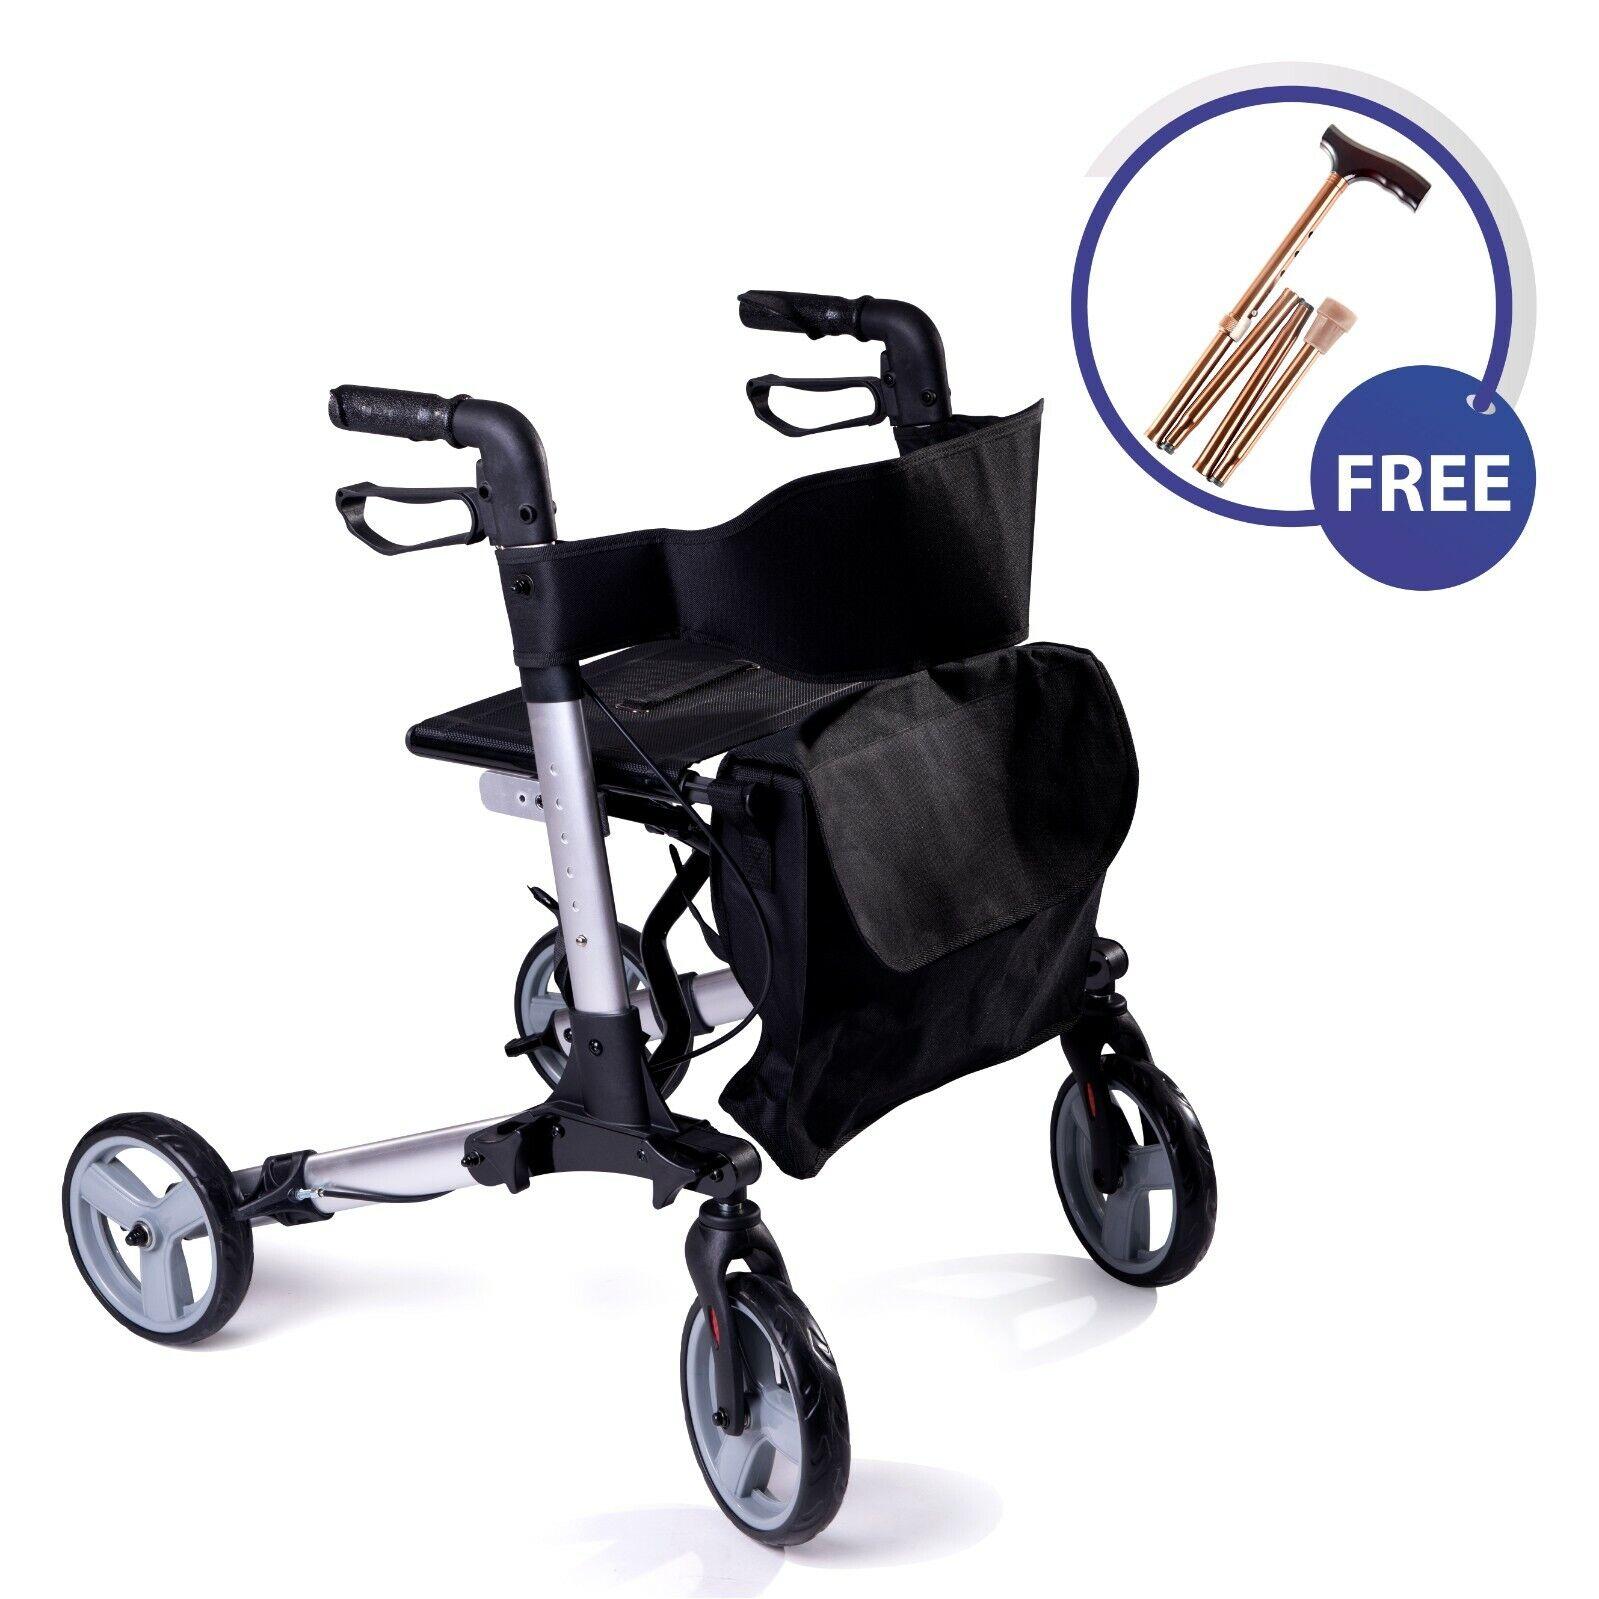 SpeedCare folding lightweight 4 wheeled rollator walker walk